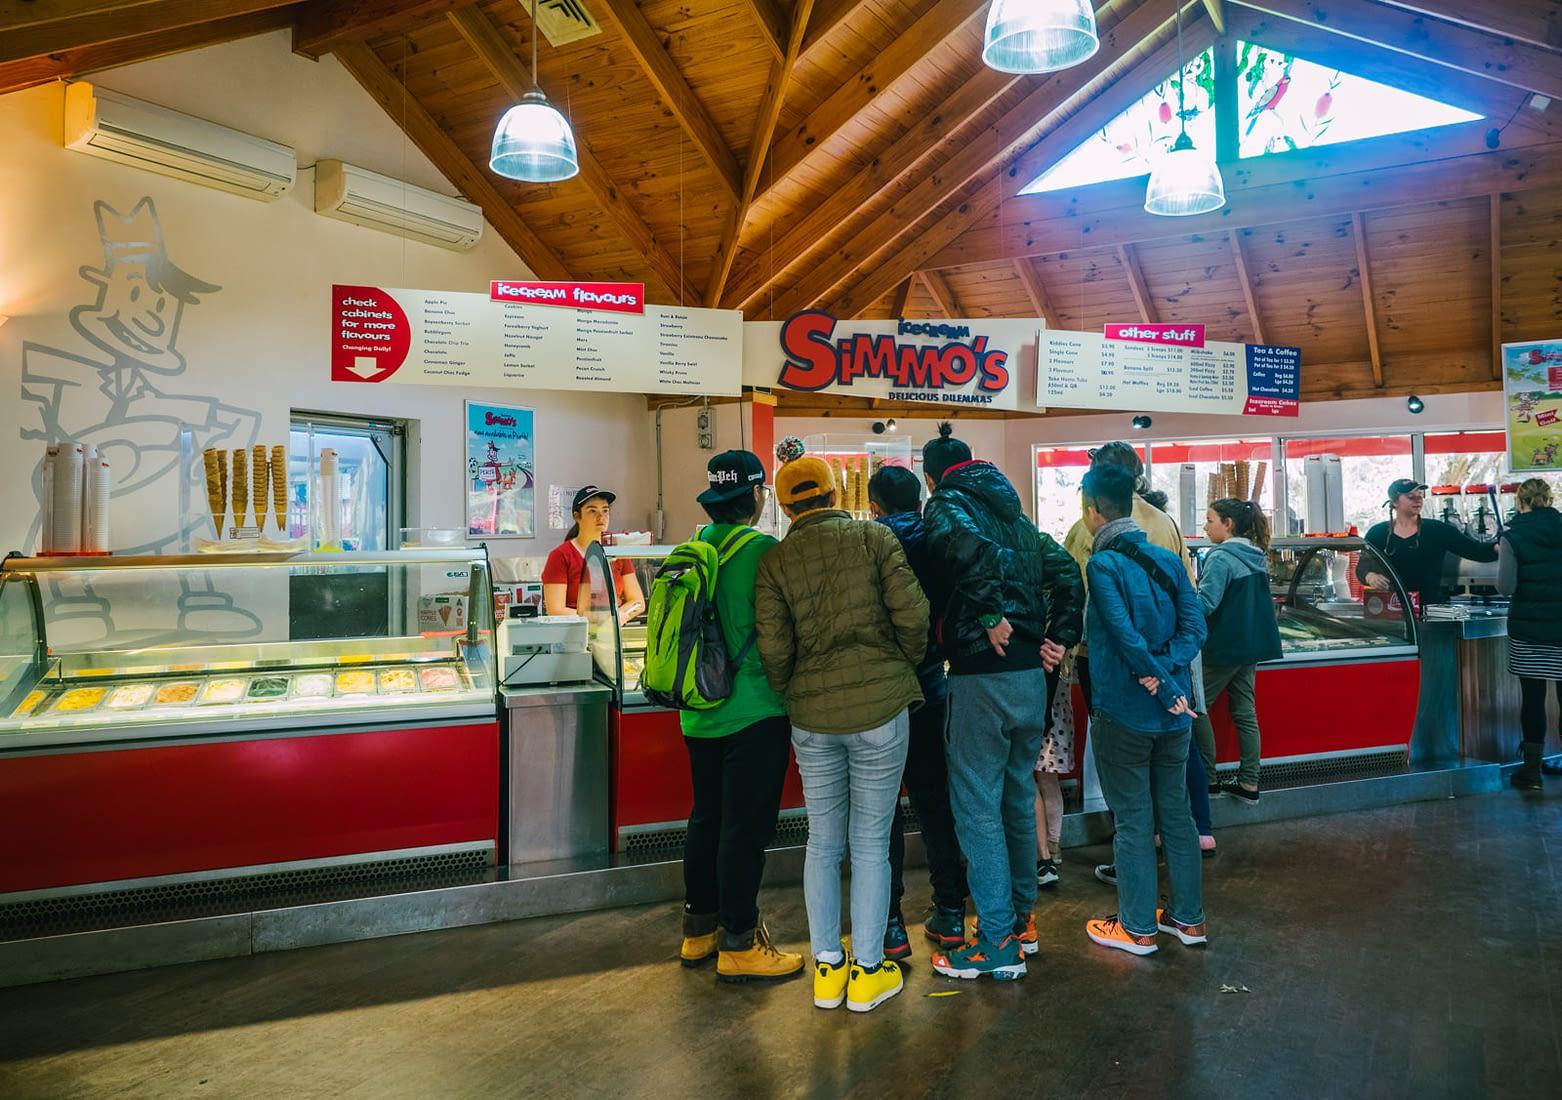 Perth, Australia - Simmo's ice cream shop